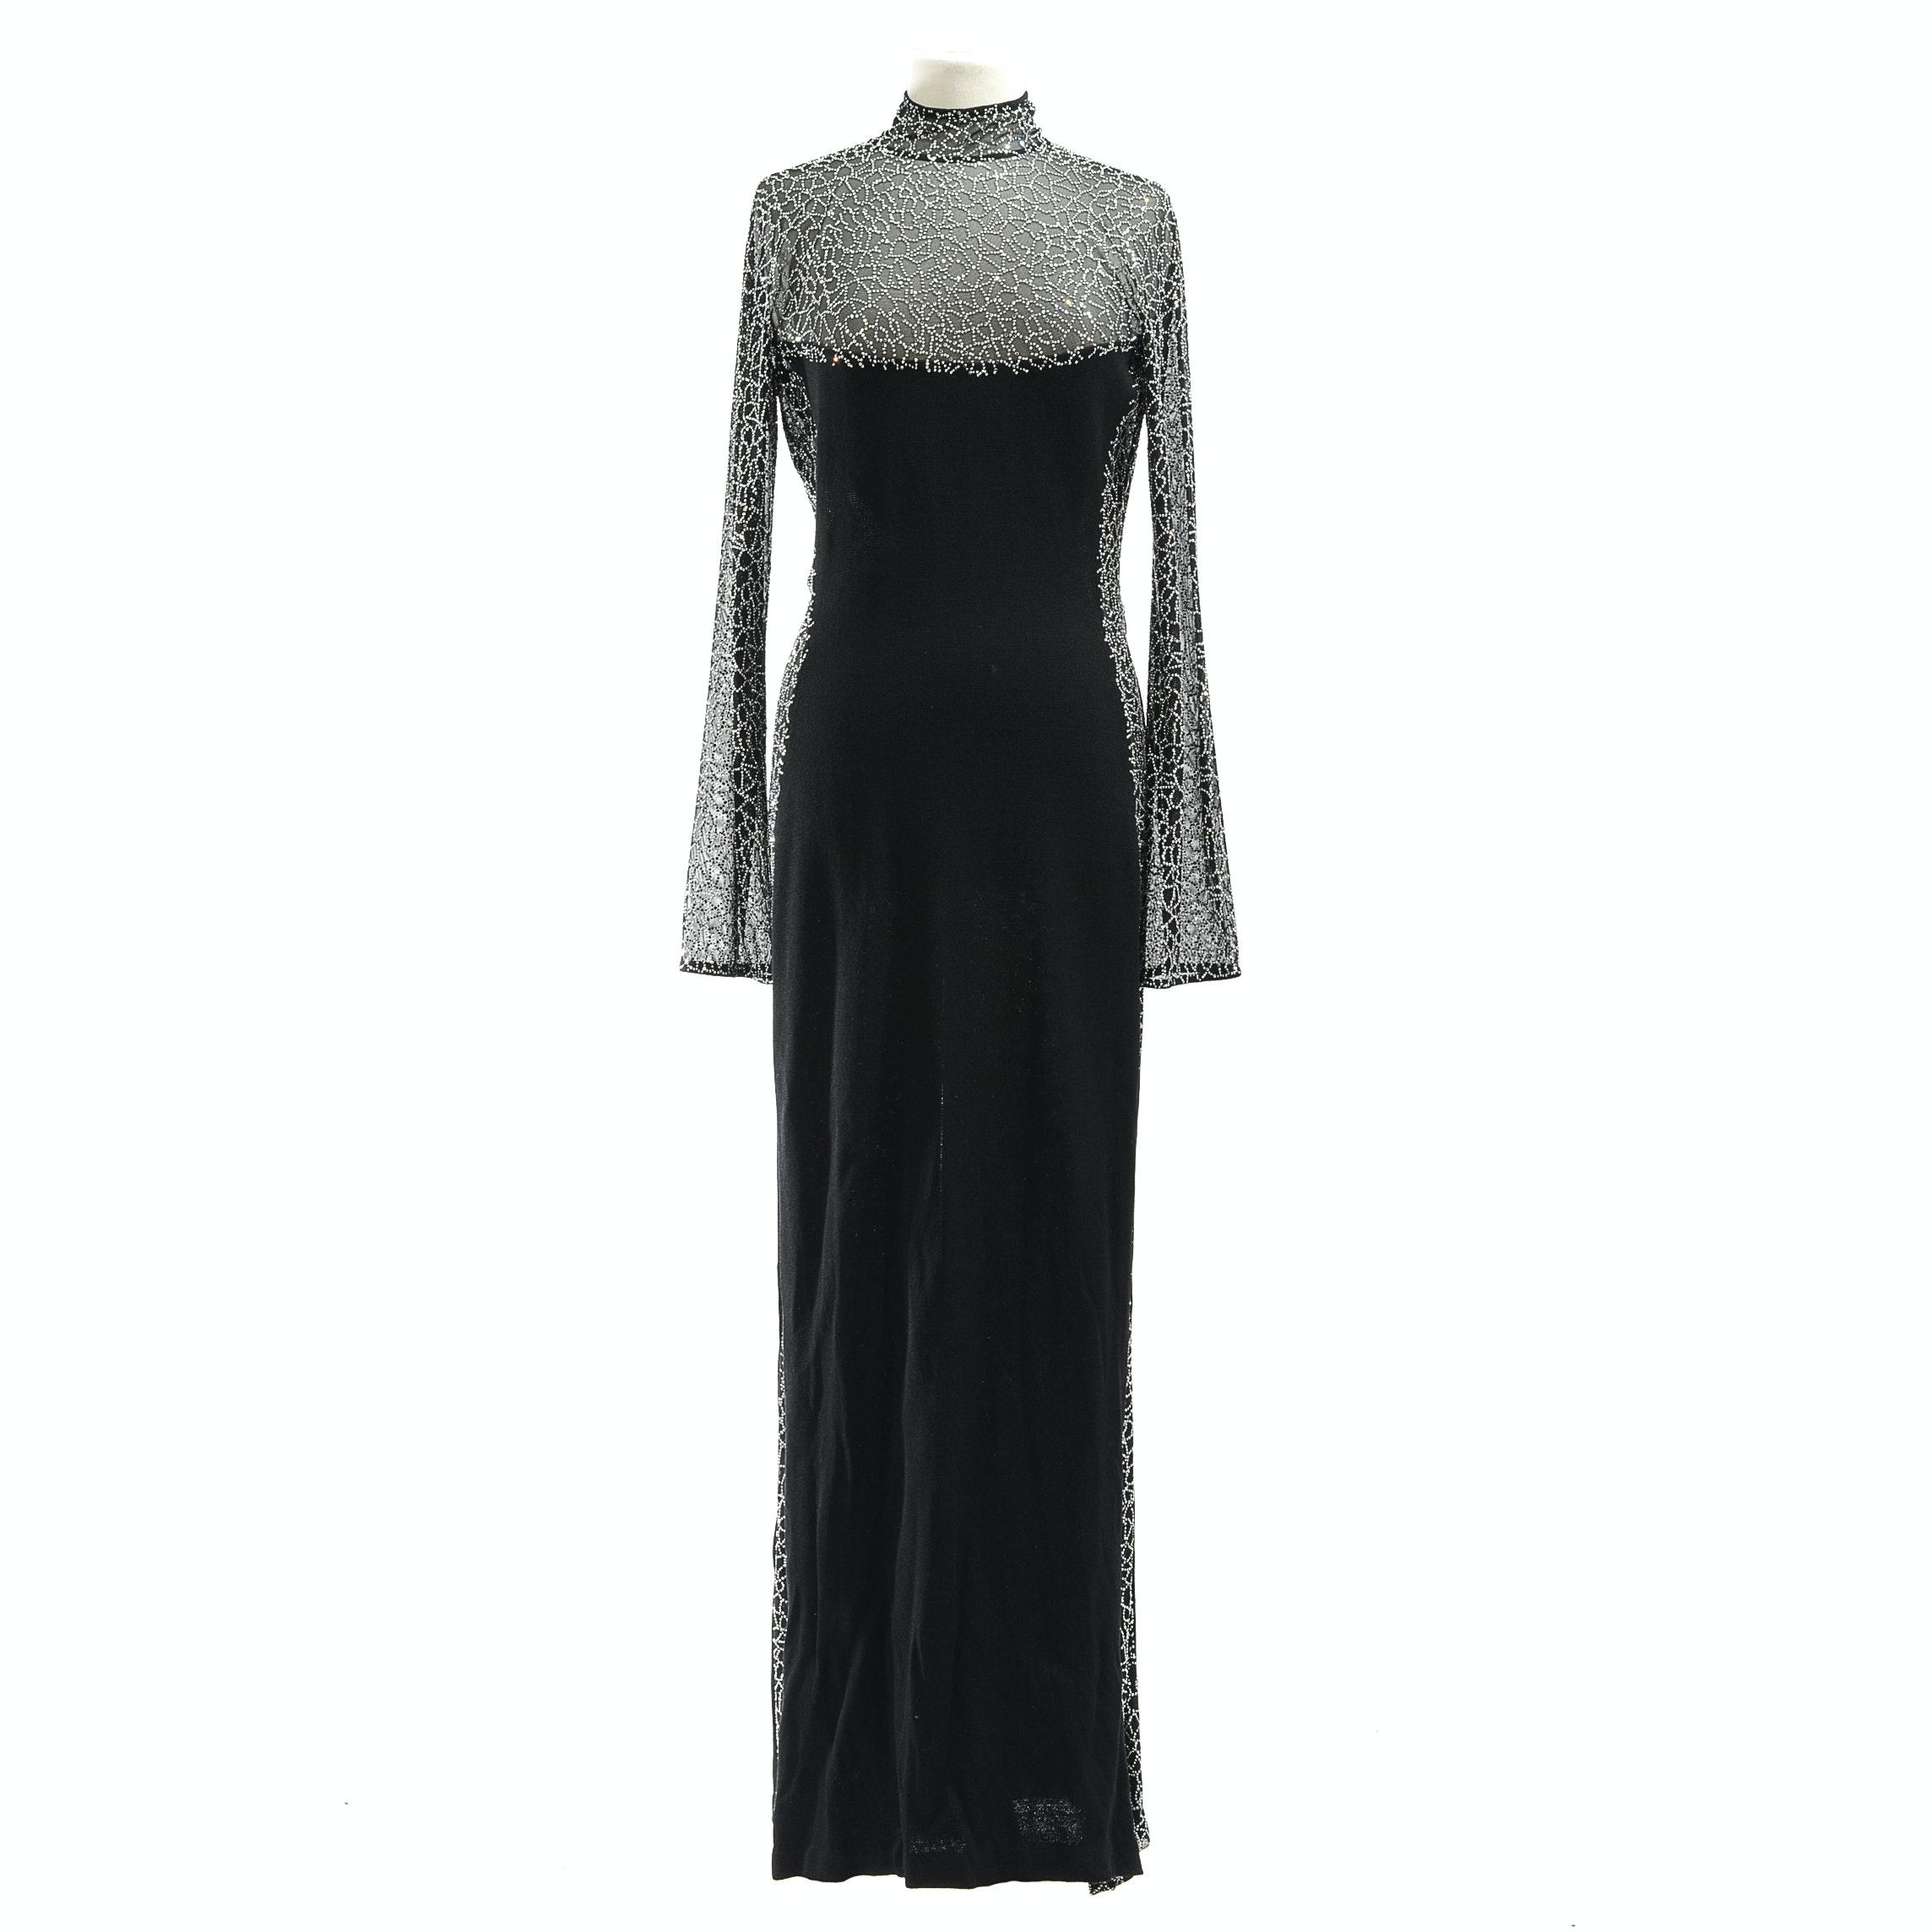 St john marie gray evening dresses